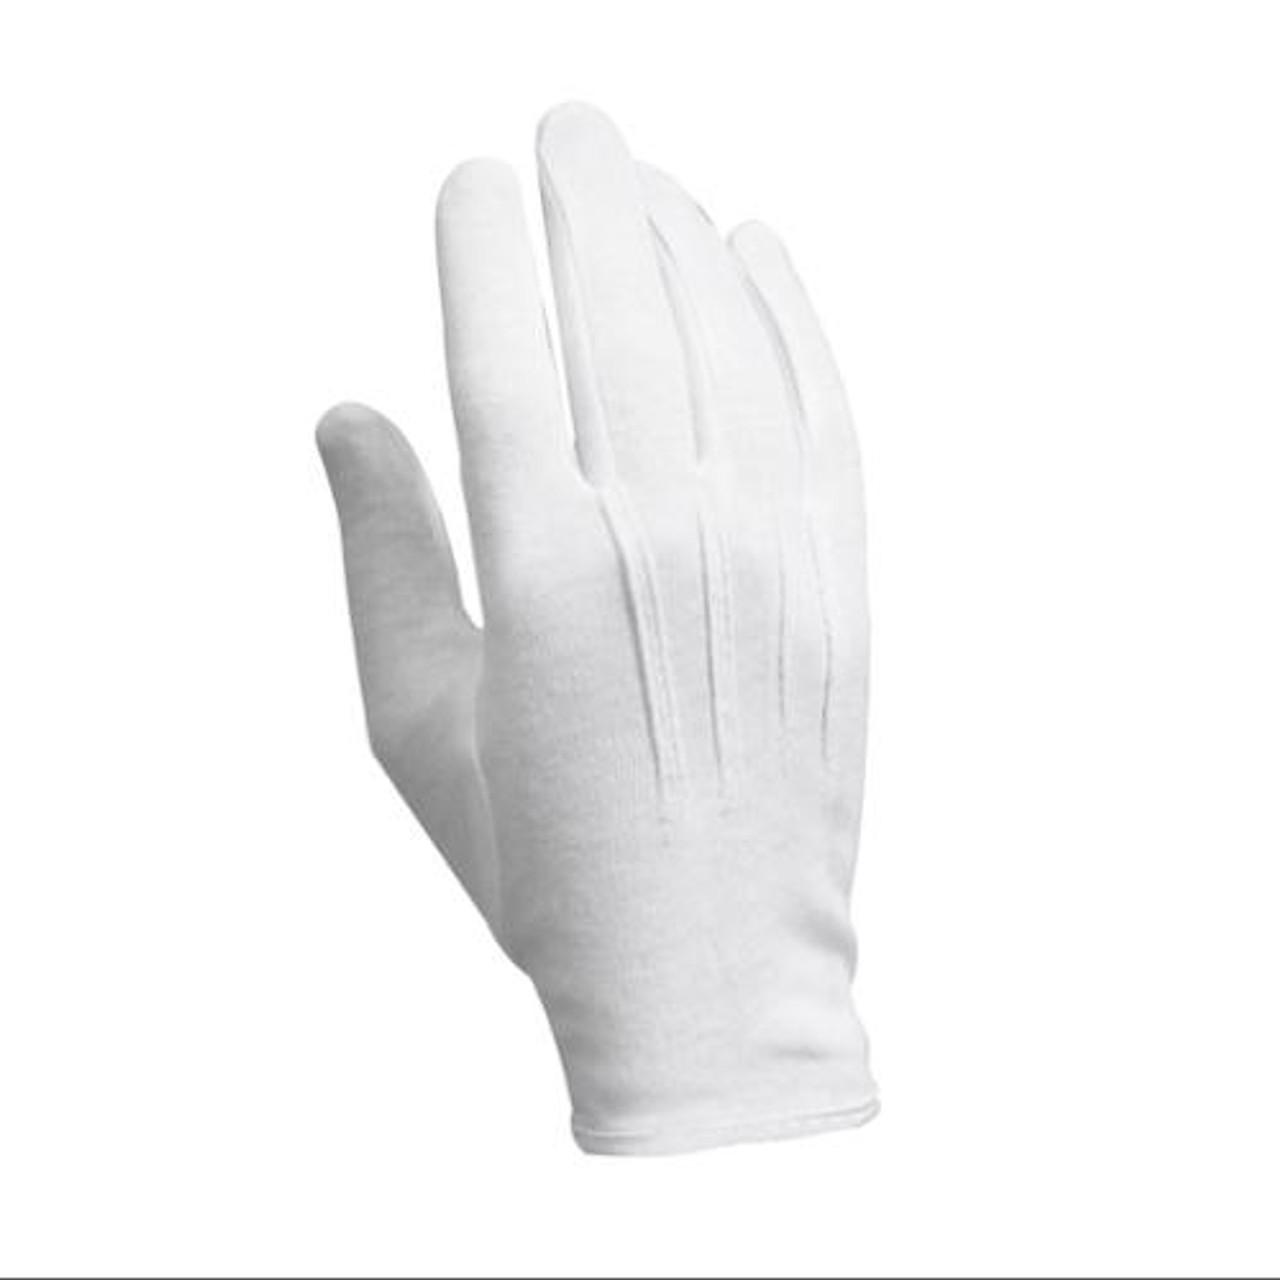 Surplus Canadian Forces White Dress Gloves